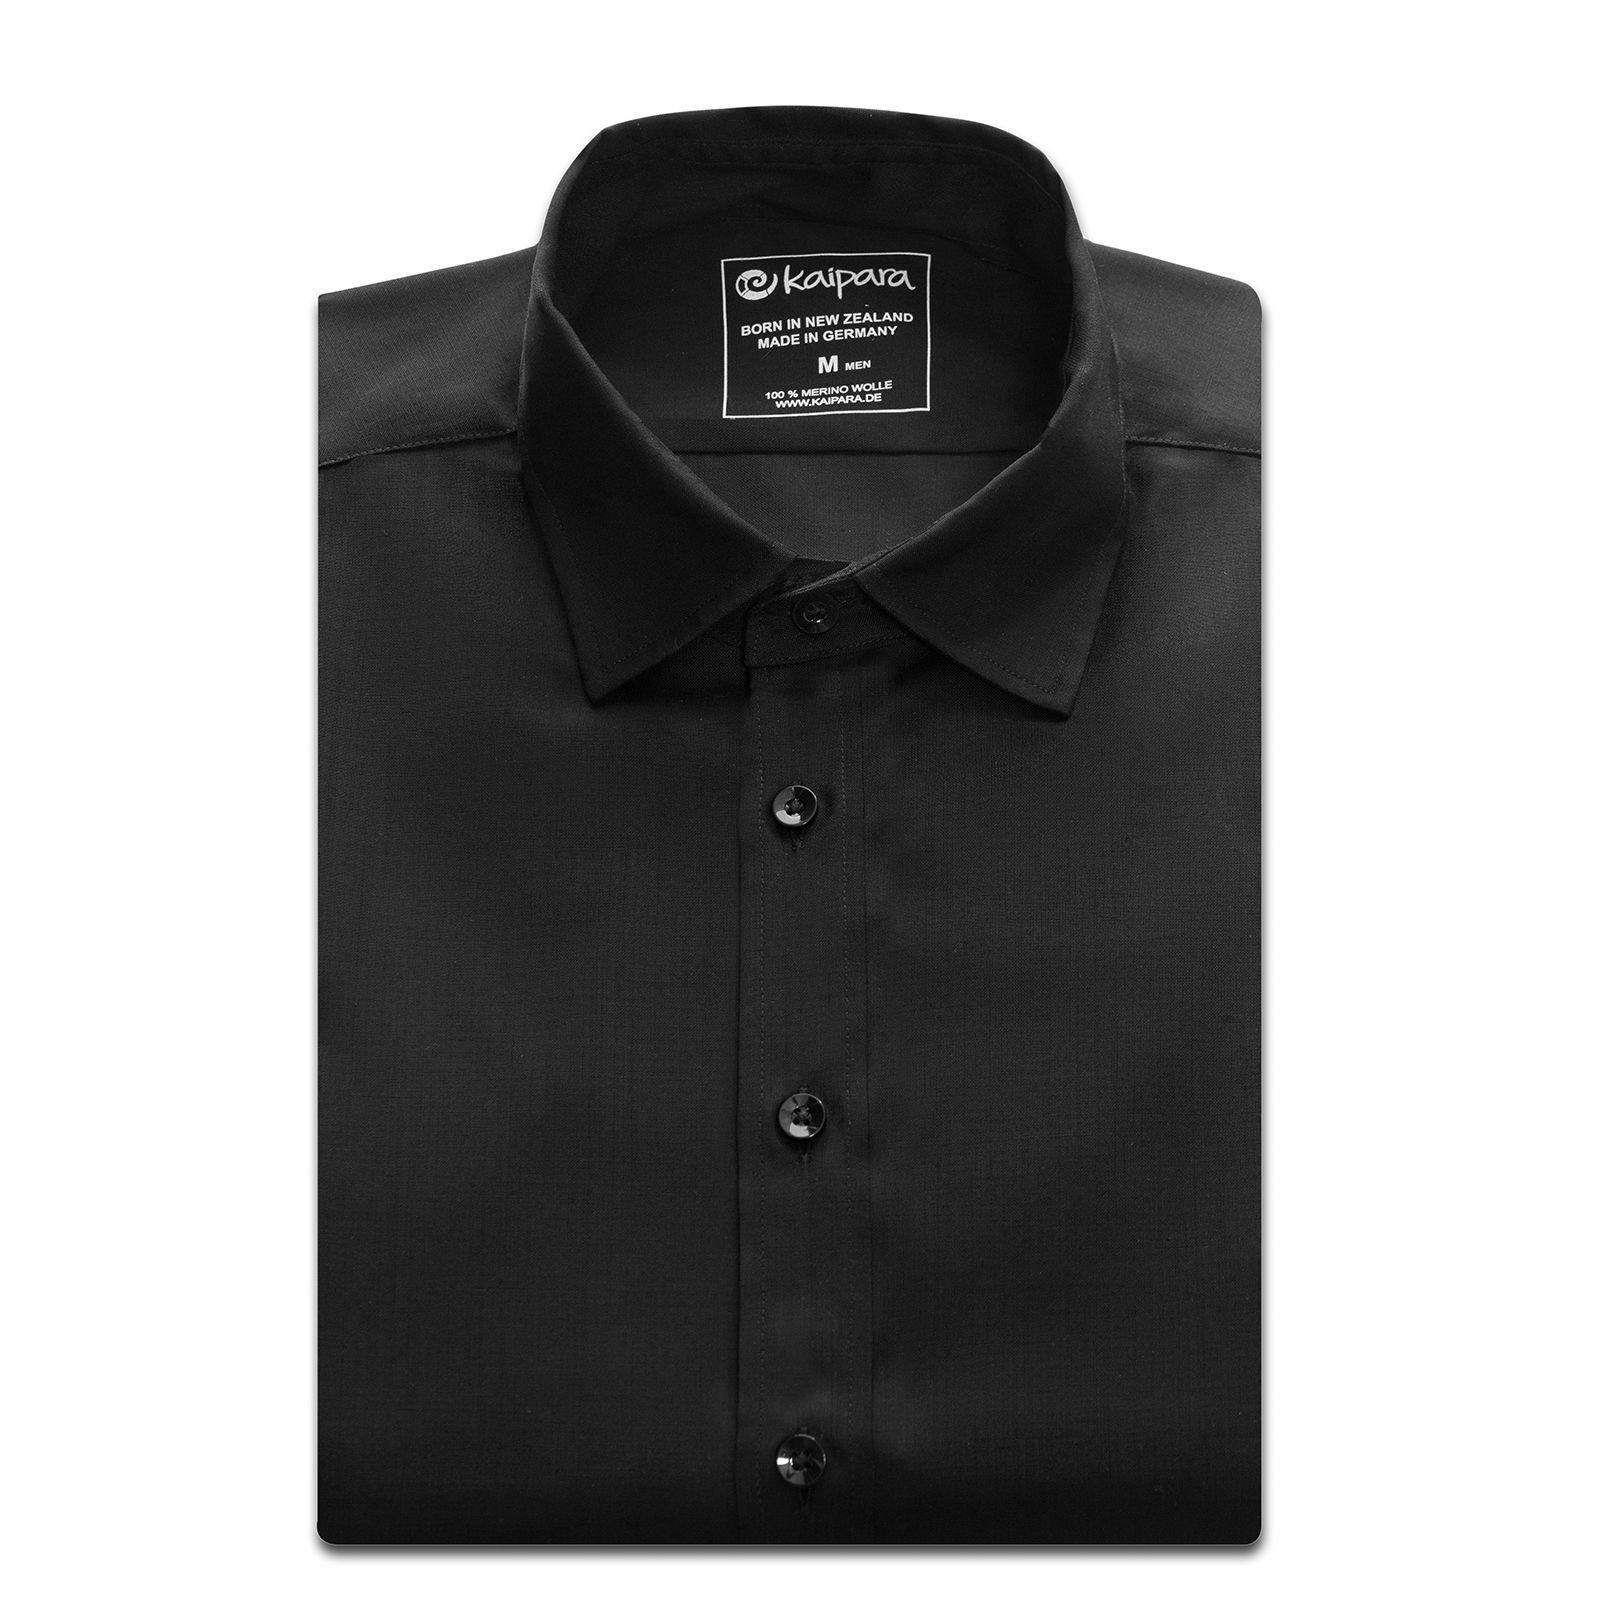 URBAN LIMITED Merino Hemd Slimfit 135 Black S